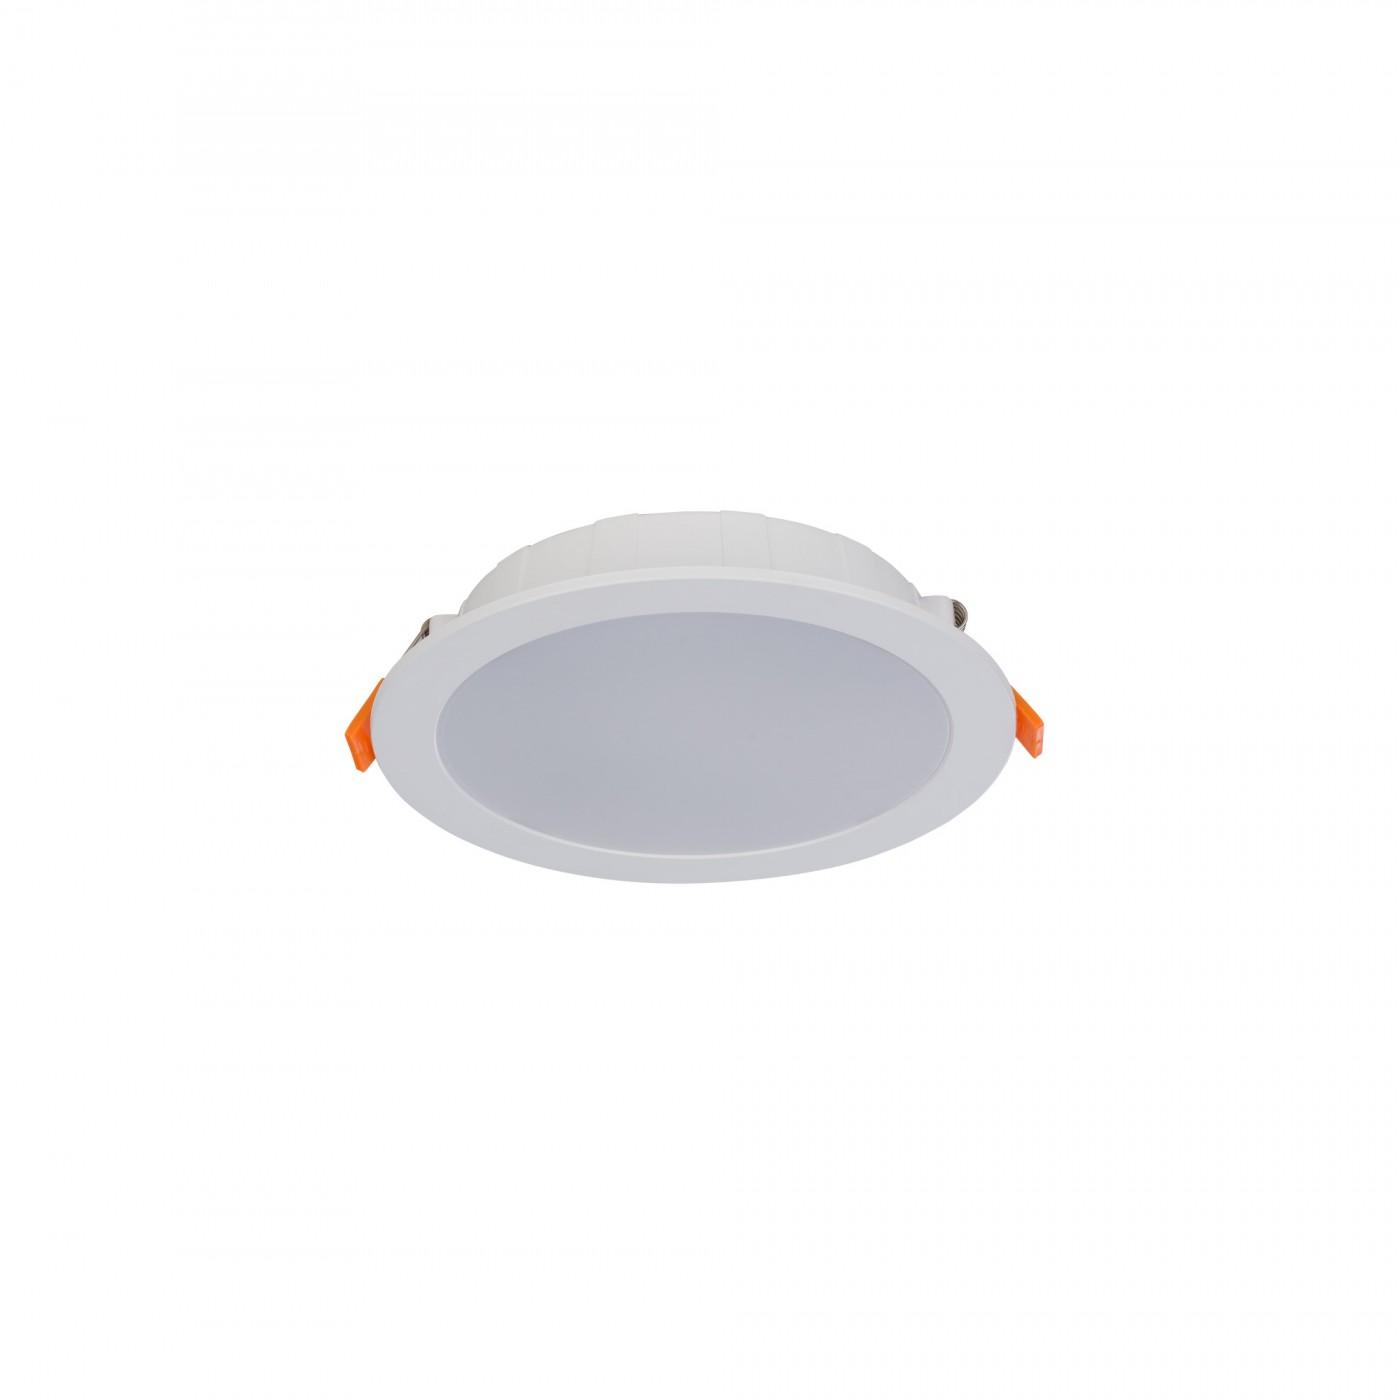 CL KOS LED 16W 3000K 8777 Nowodvorski Lighting